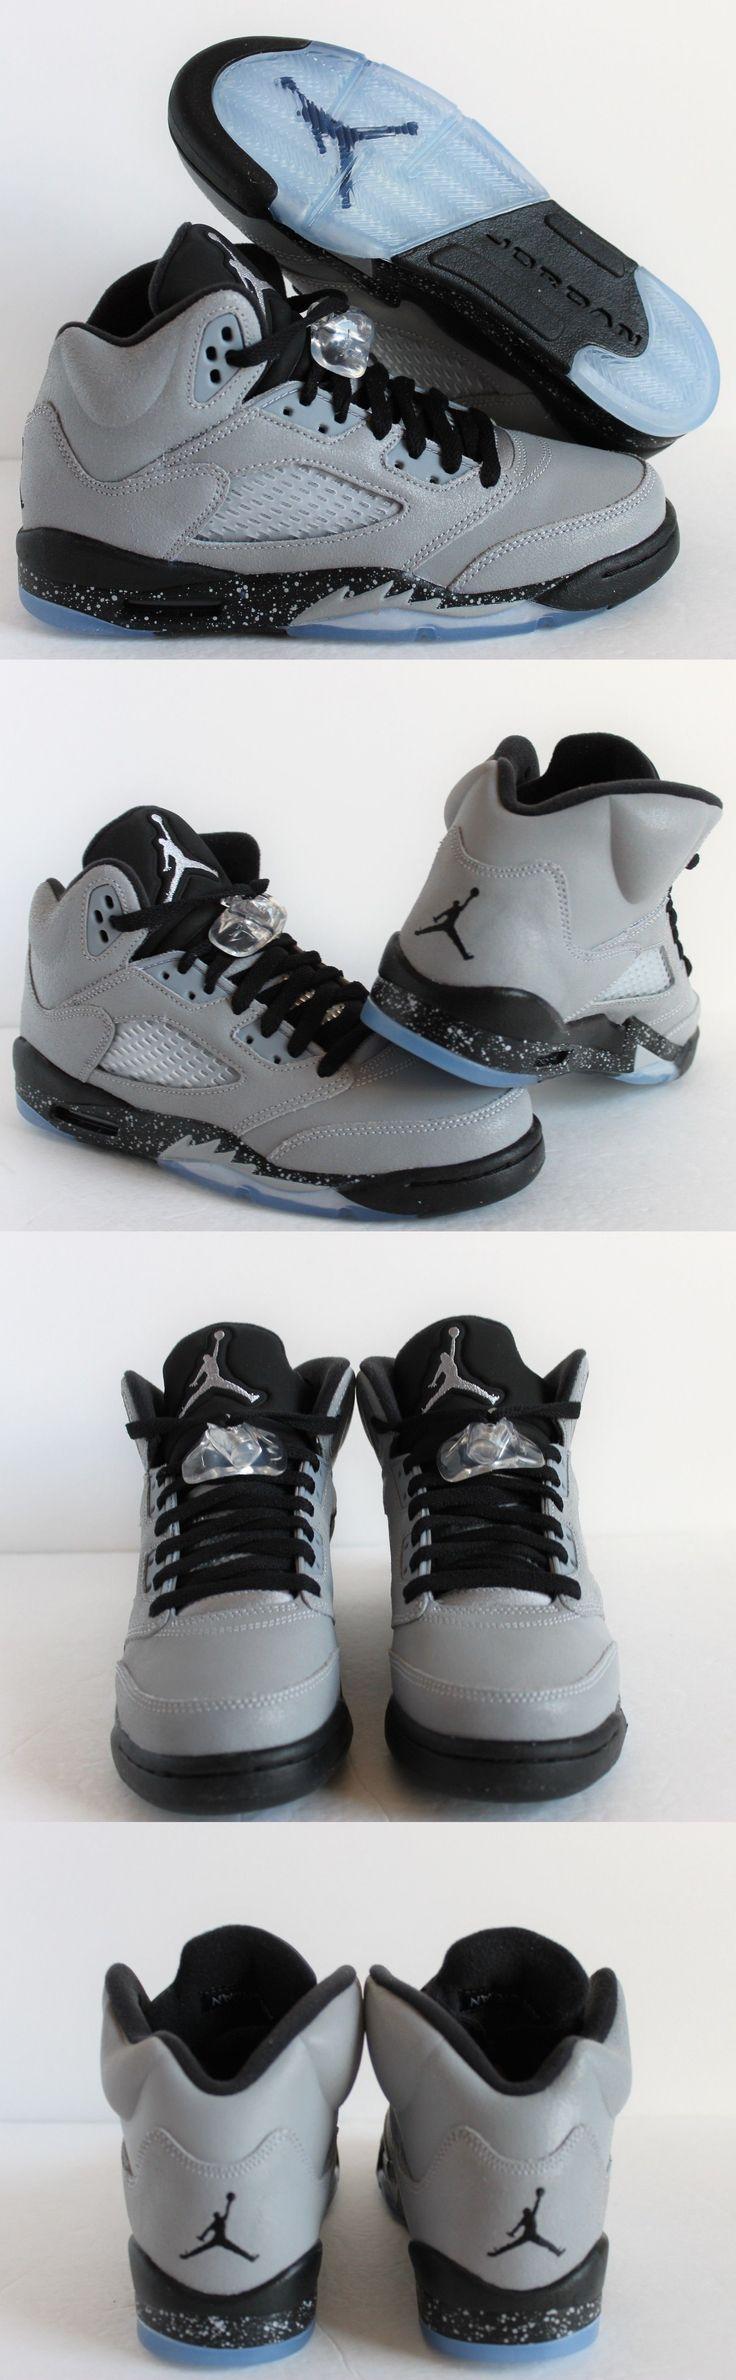 Unisex Shoes 155202: Air Jordan 5 Retro Gg Wolf Grey-Black Sz 6Y -Womens Sz 7.5 [440892-008] -> BUY IT NOW ONLY: $125.99 on eBay!